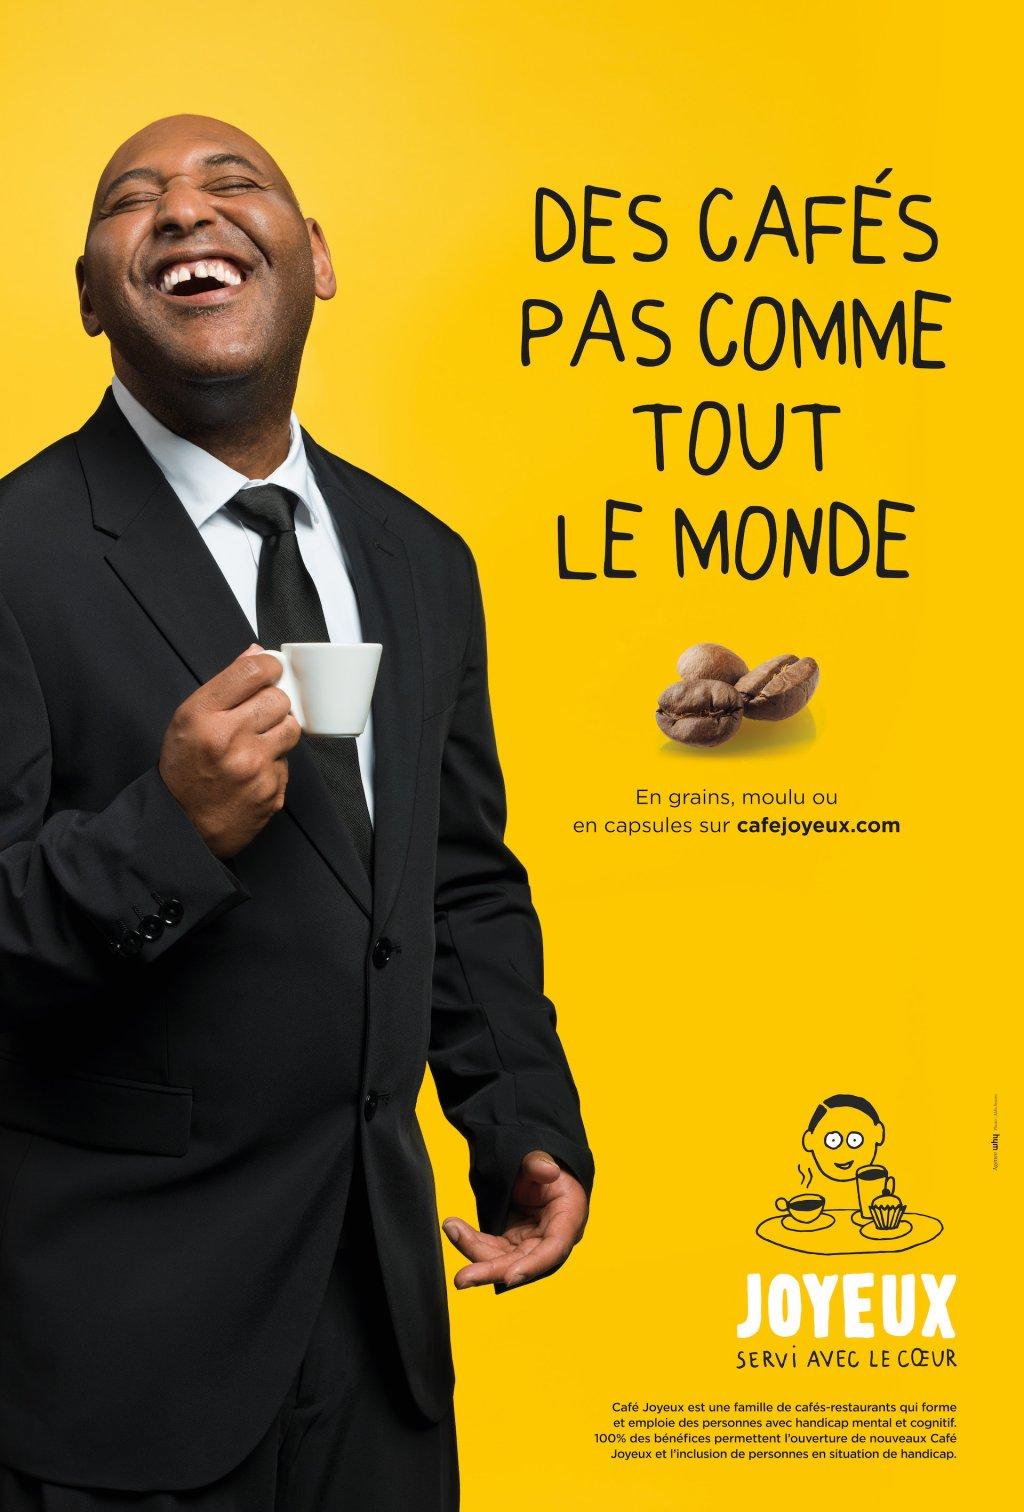 Café Joyeux lance sa propre marque de cafés!